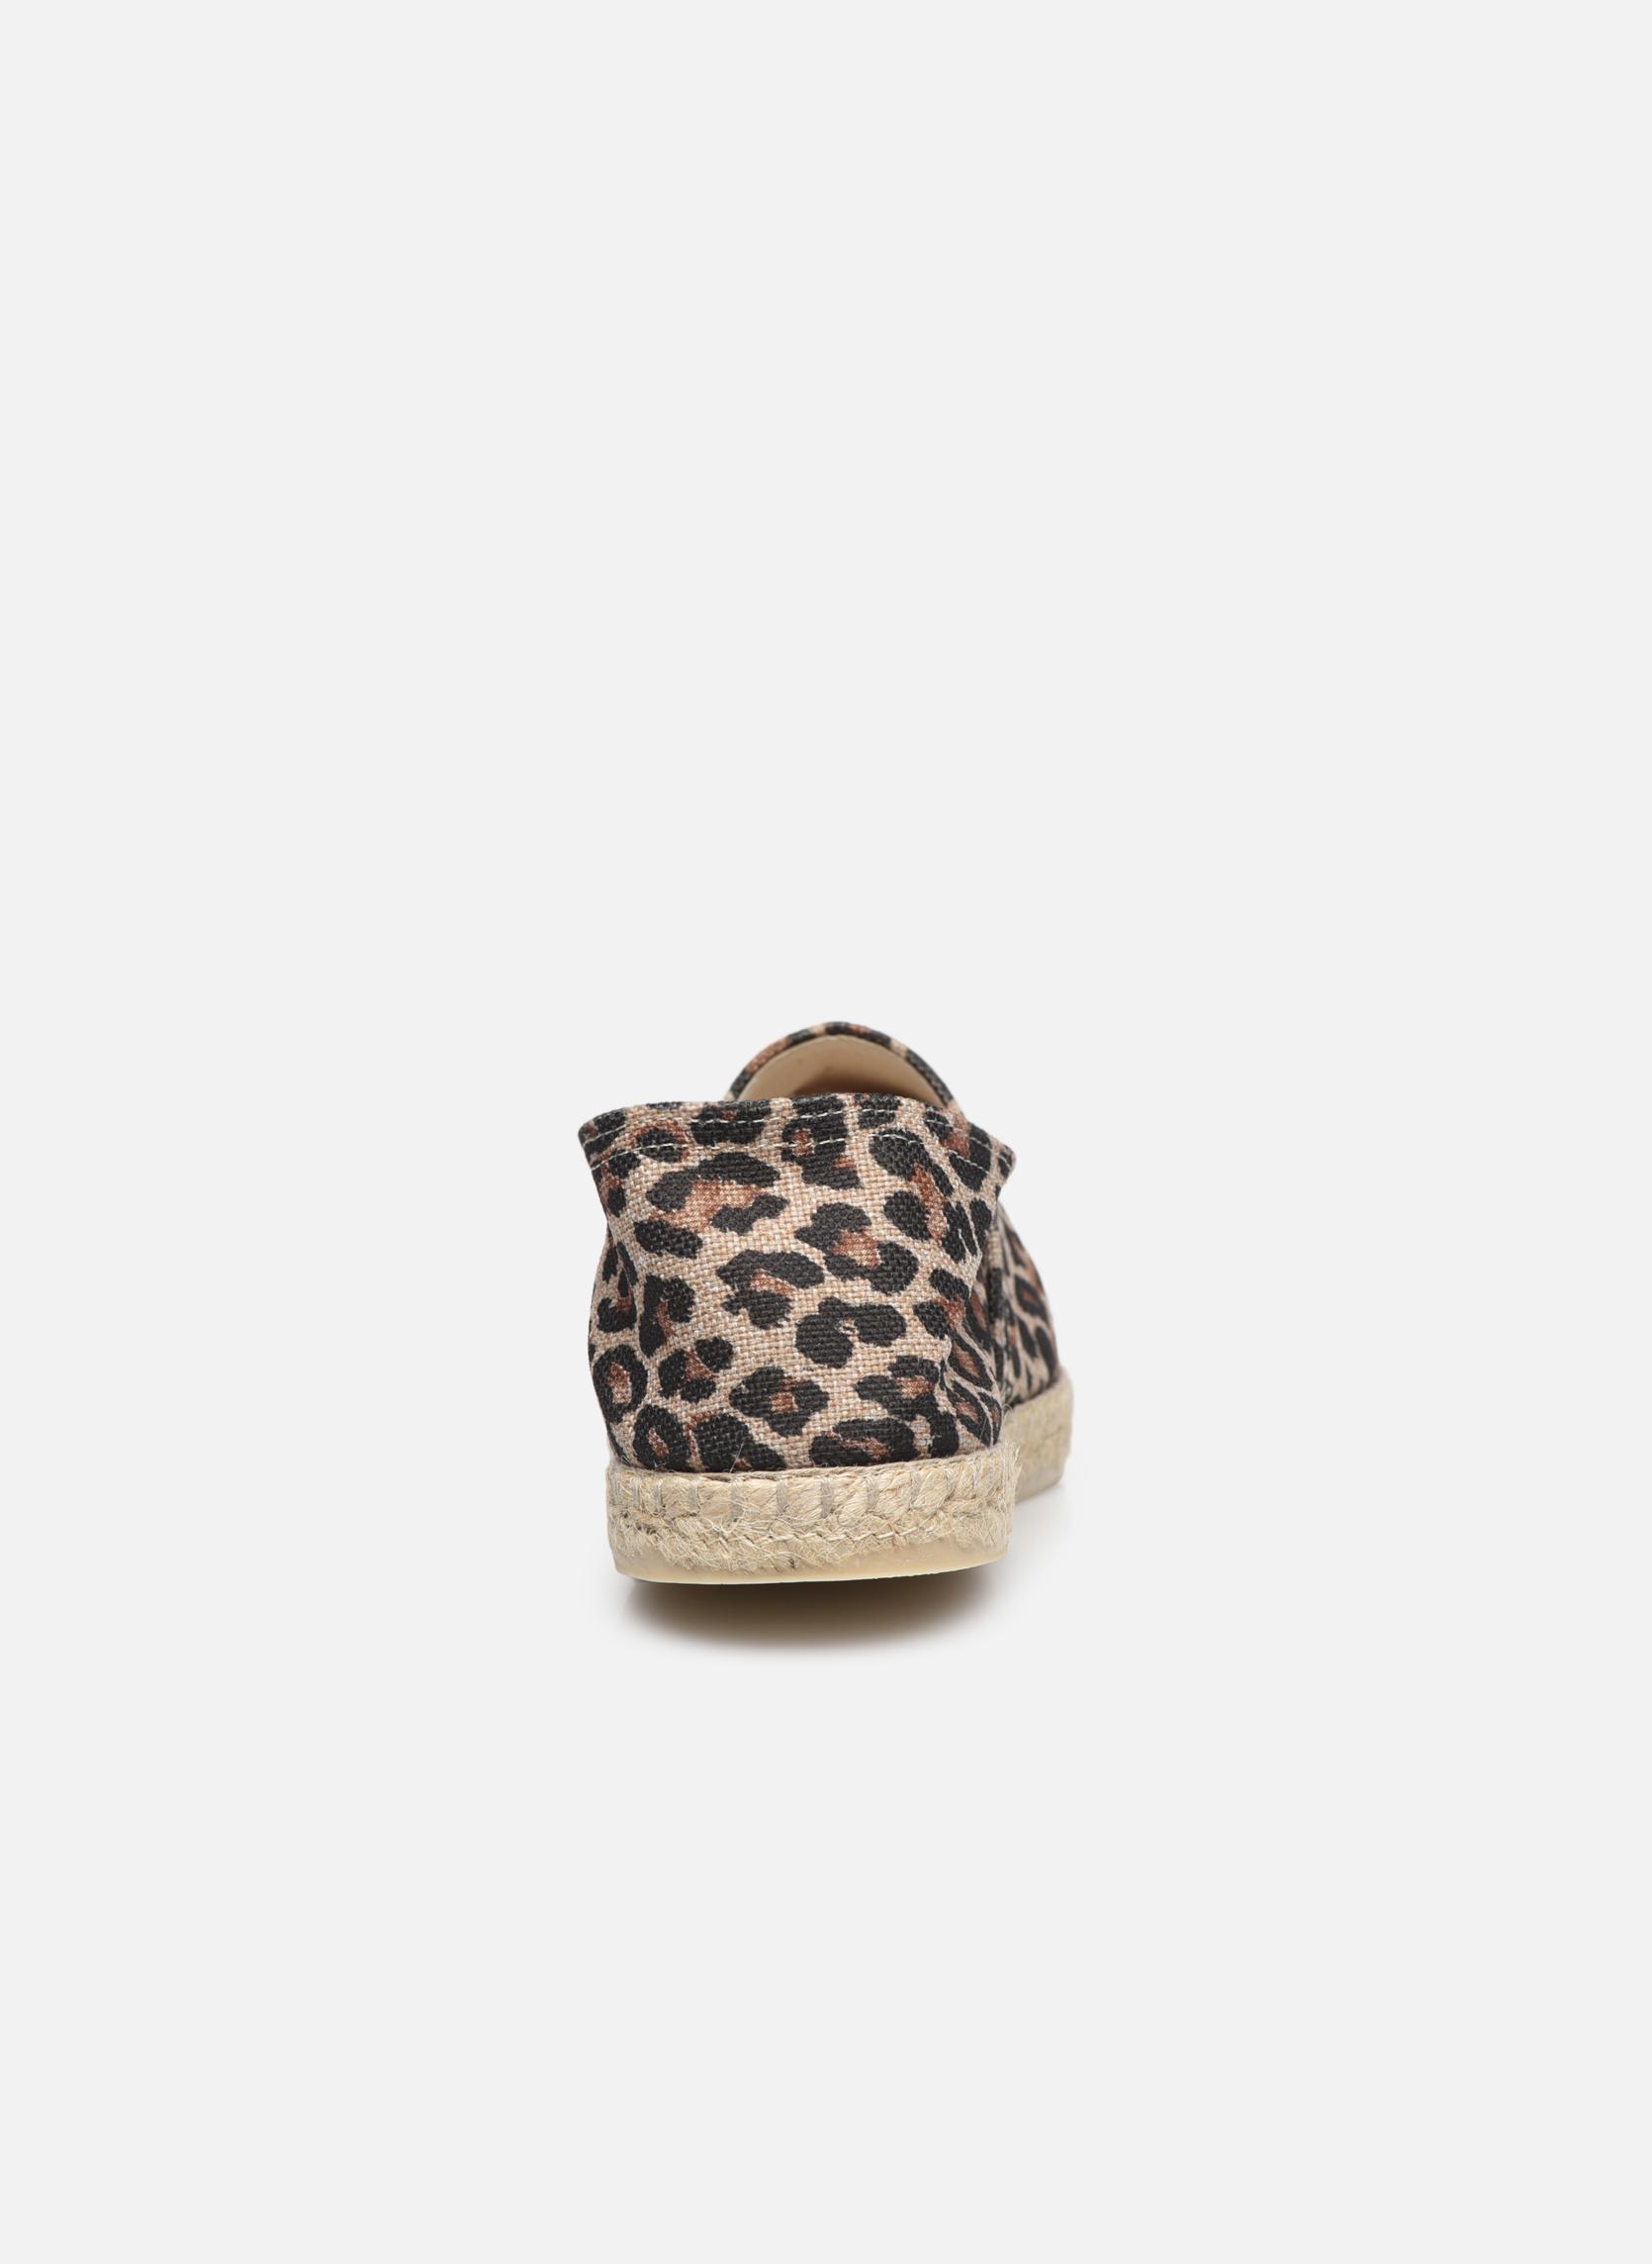 Espadrille 324 rustic Leopard